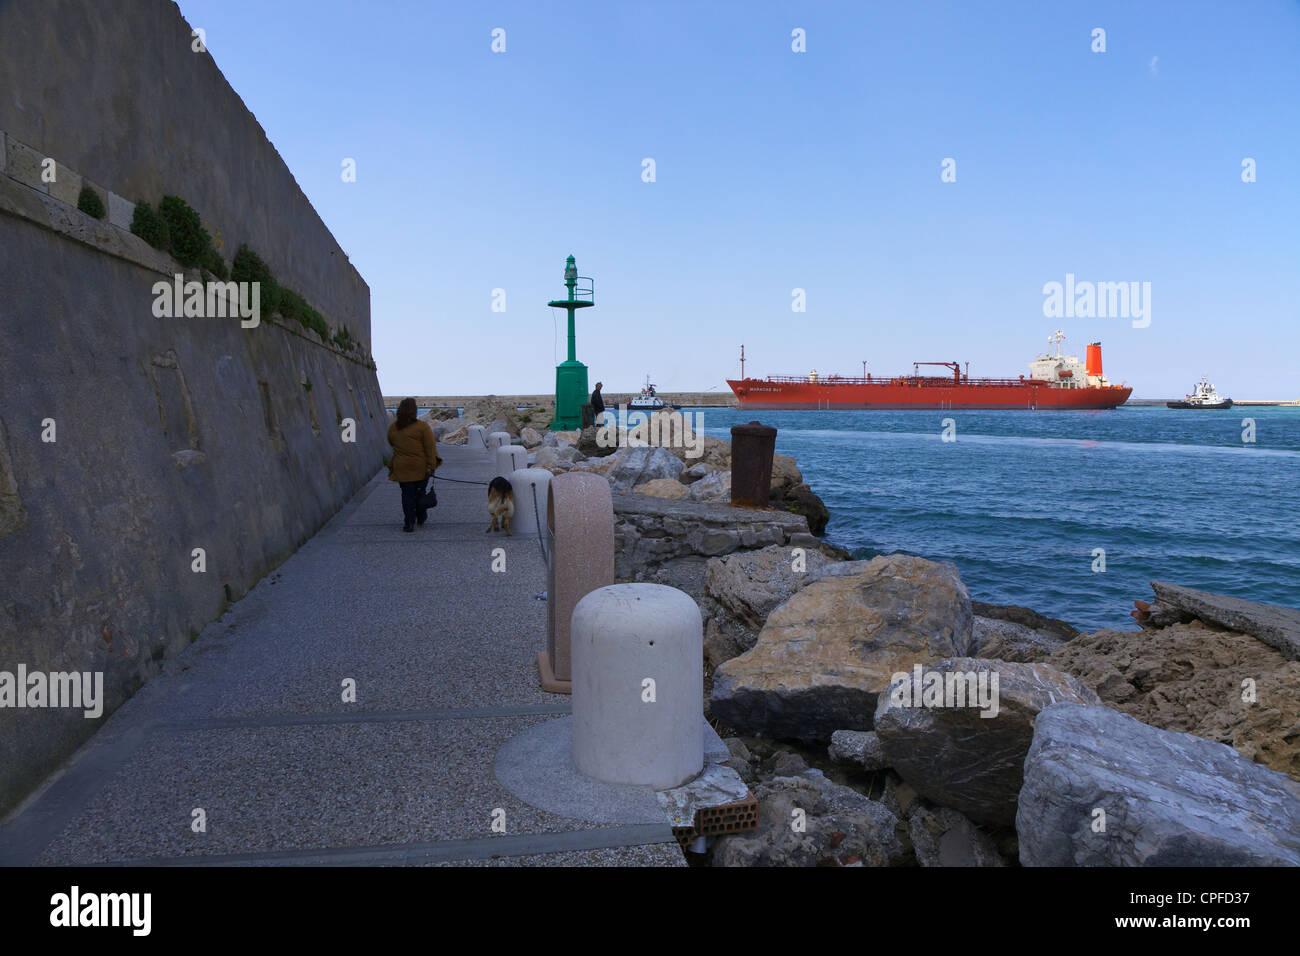 Livorno seafront - Stock Image